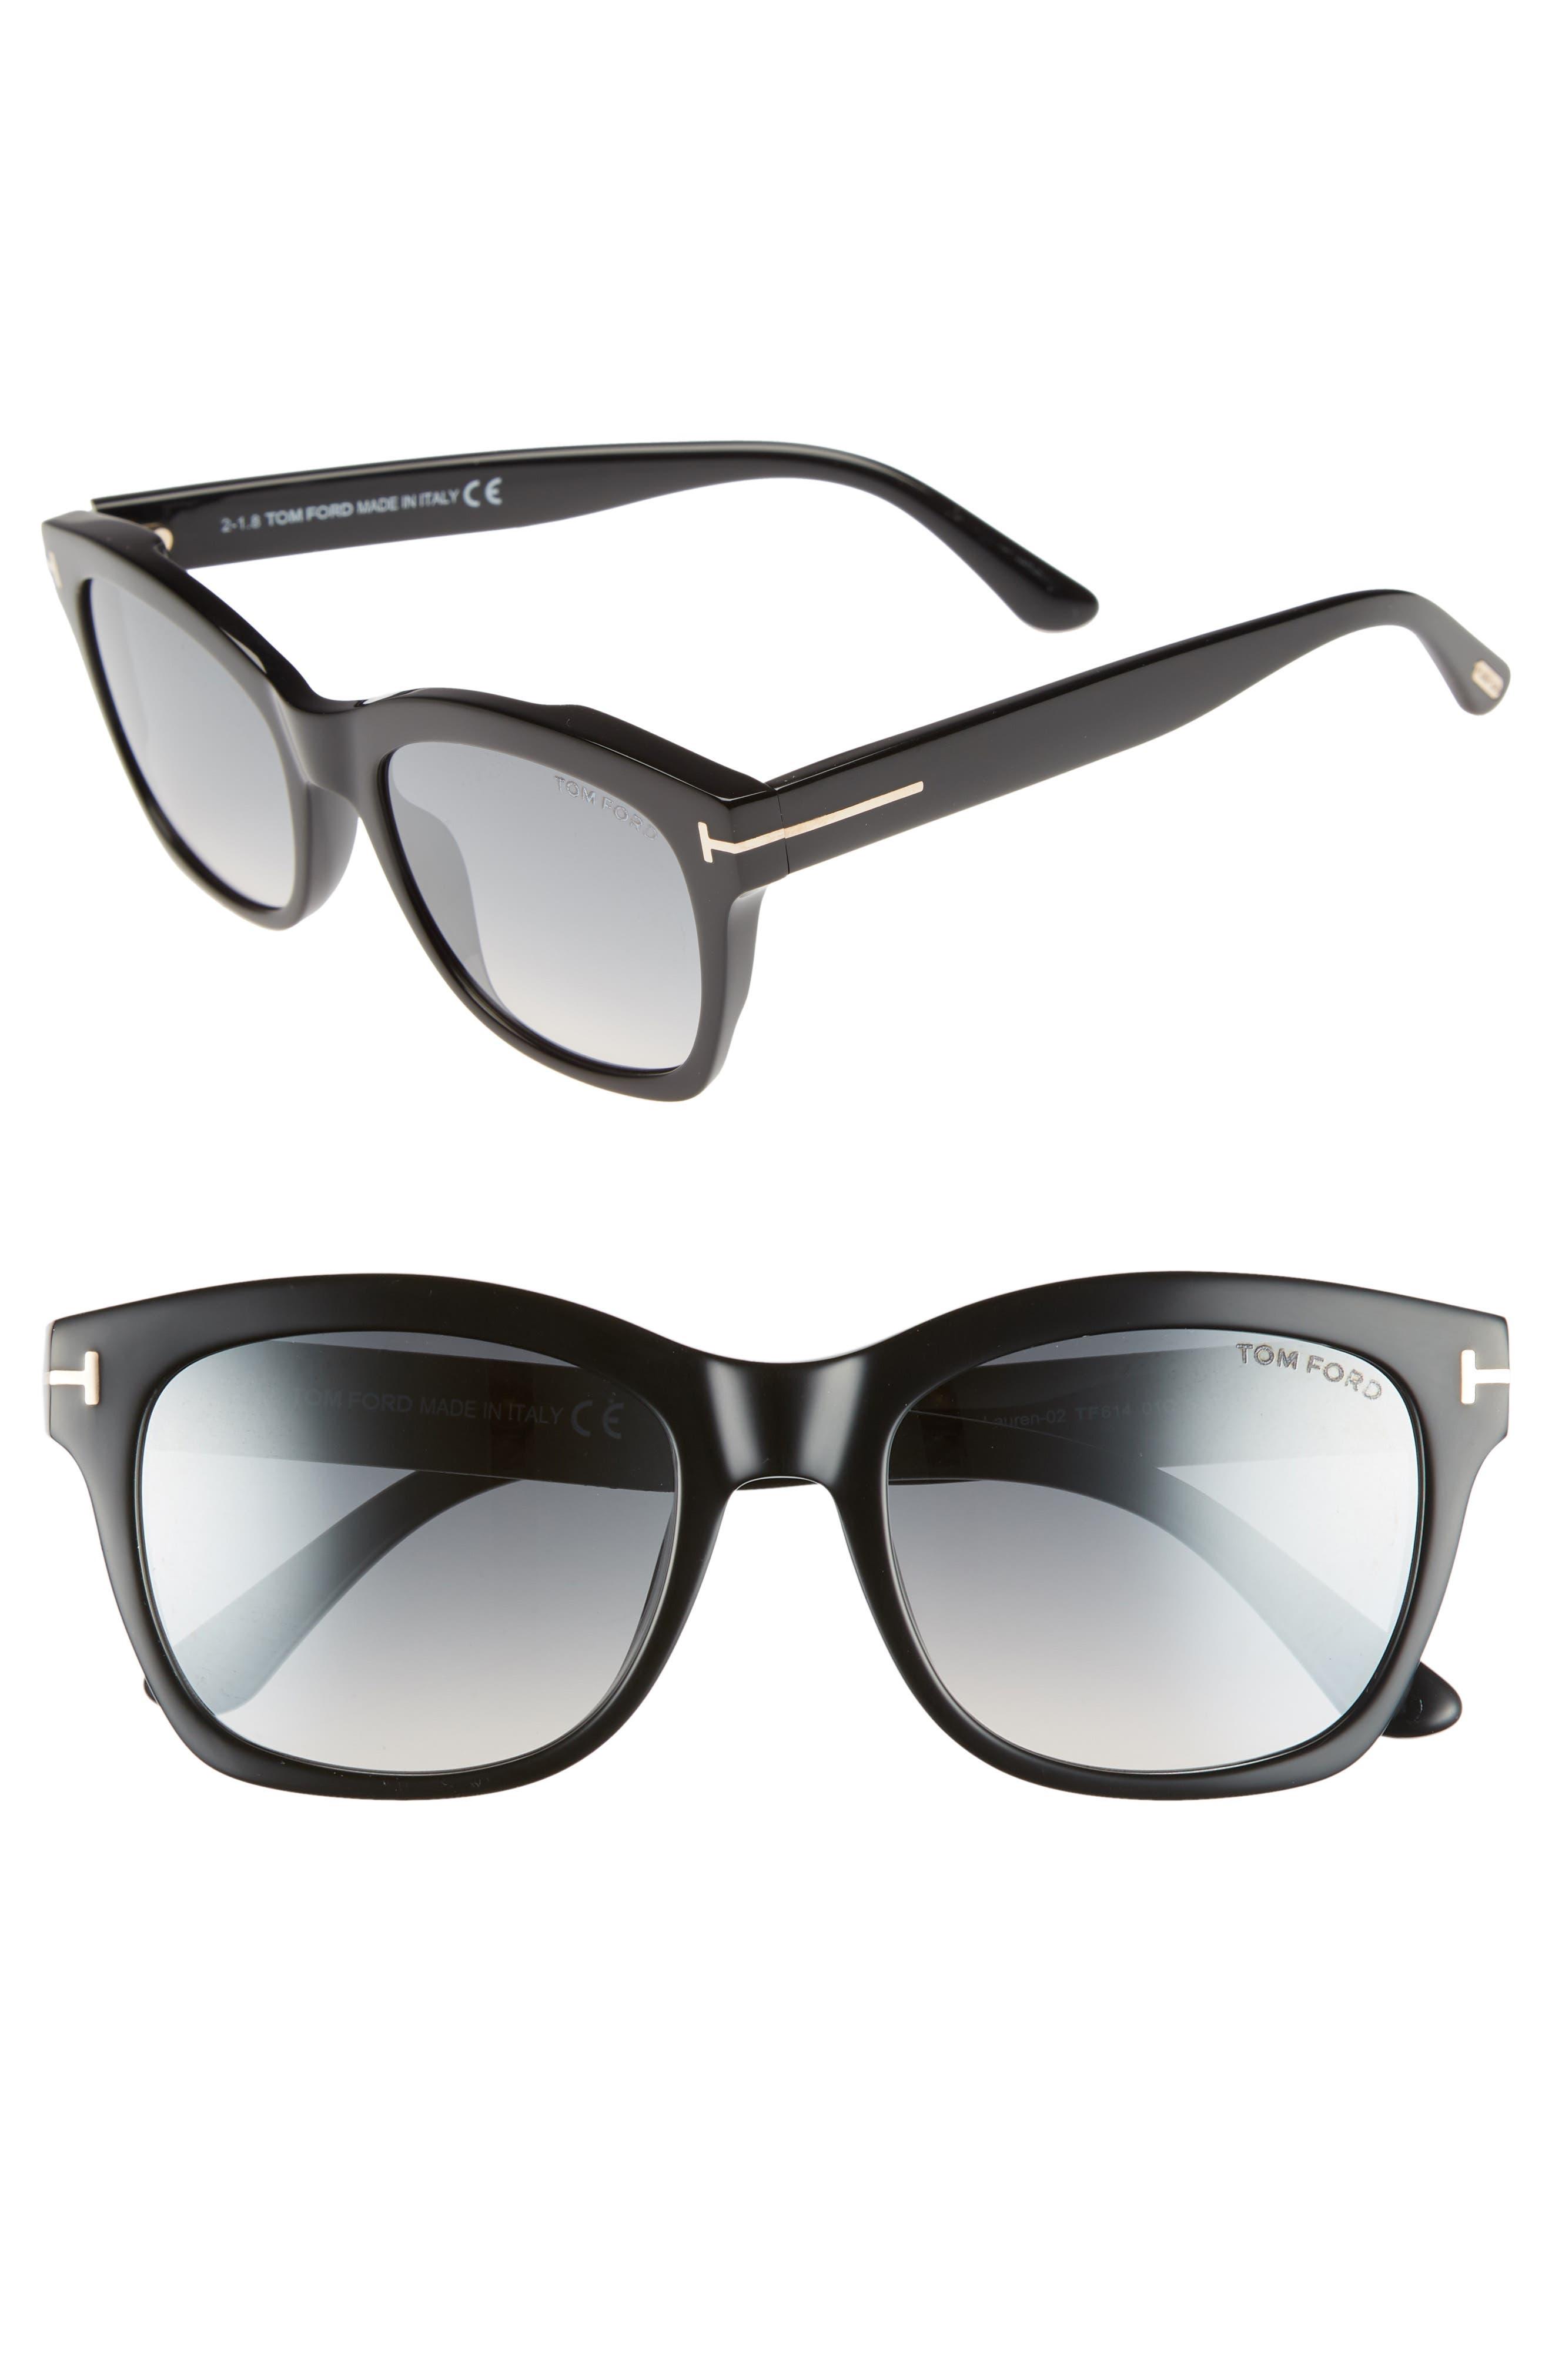 Lauren 52mm Sunglasses,                         Main,                         color, SHINY BLACK/ SMOKE MIRROR